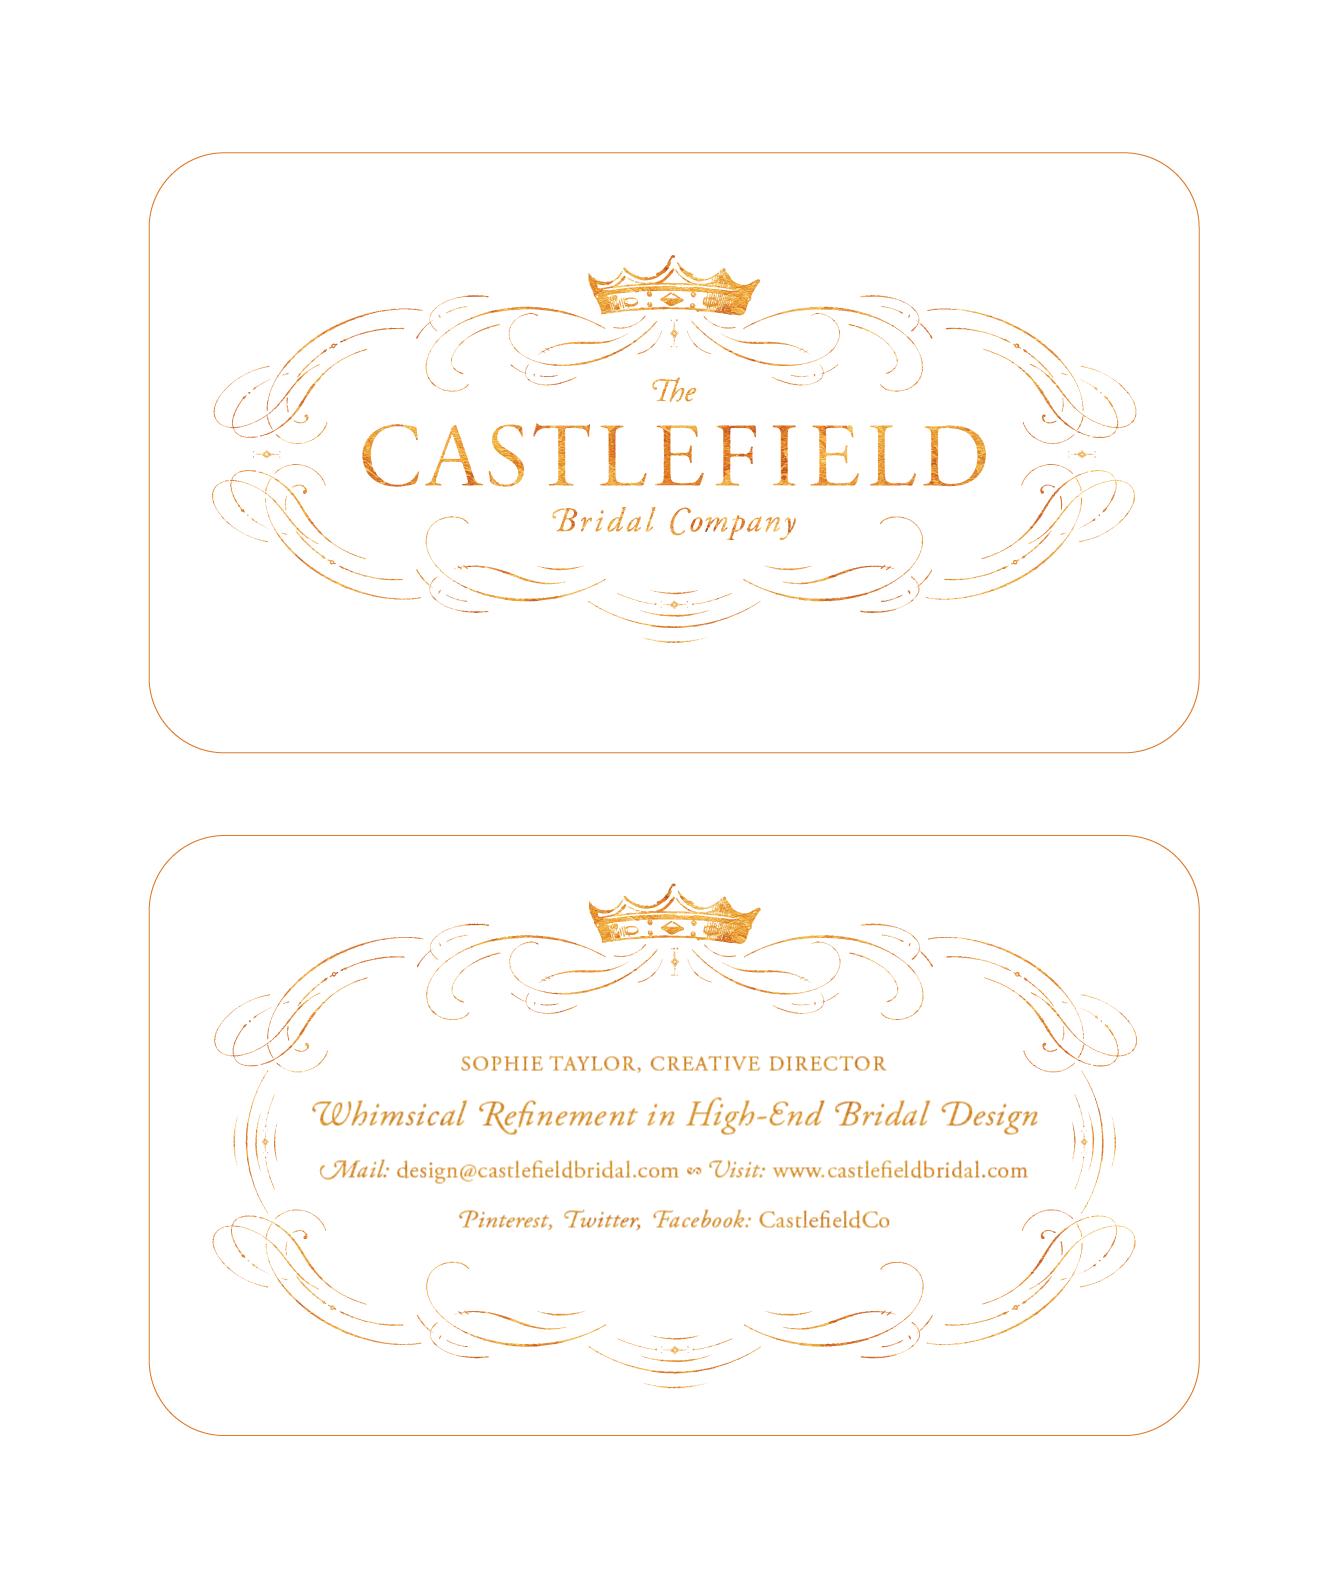 The Castlefield Bridal Company   Business Card Design ...